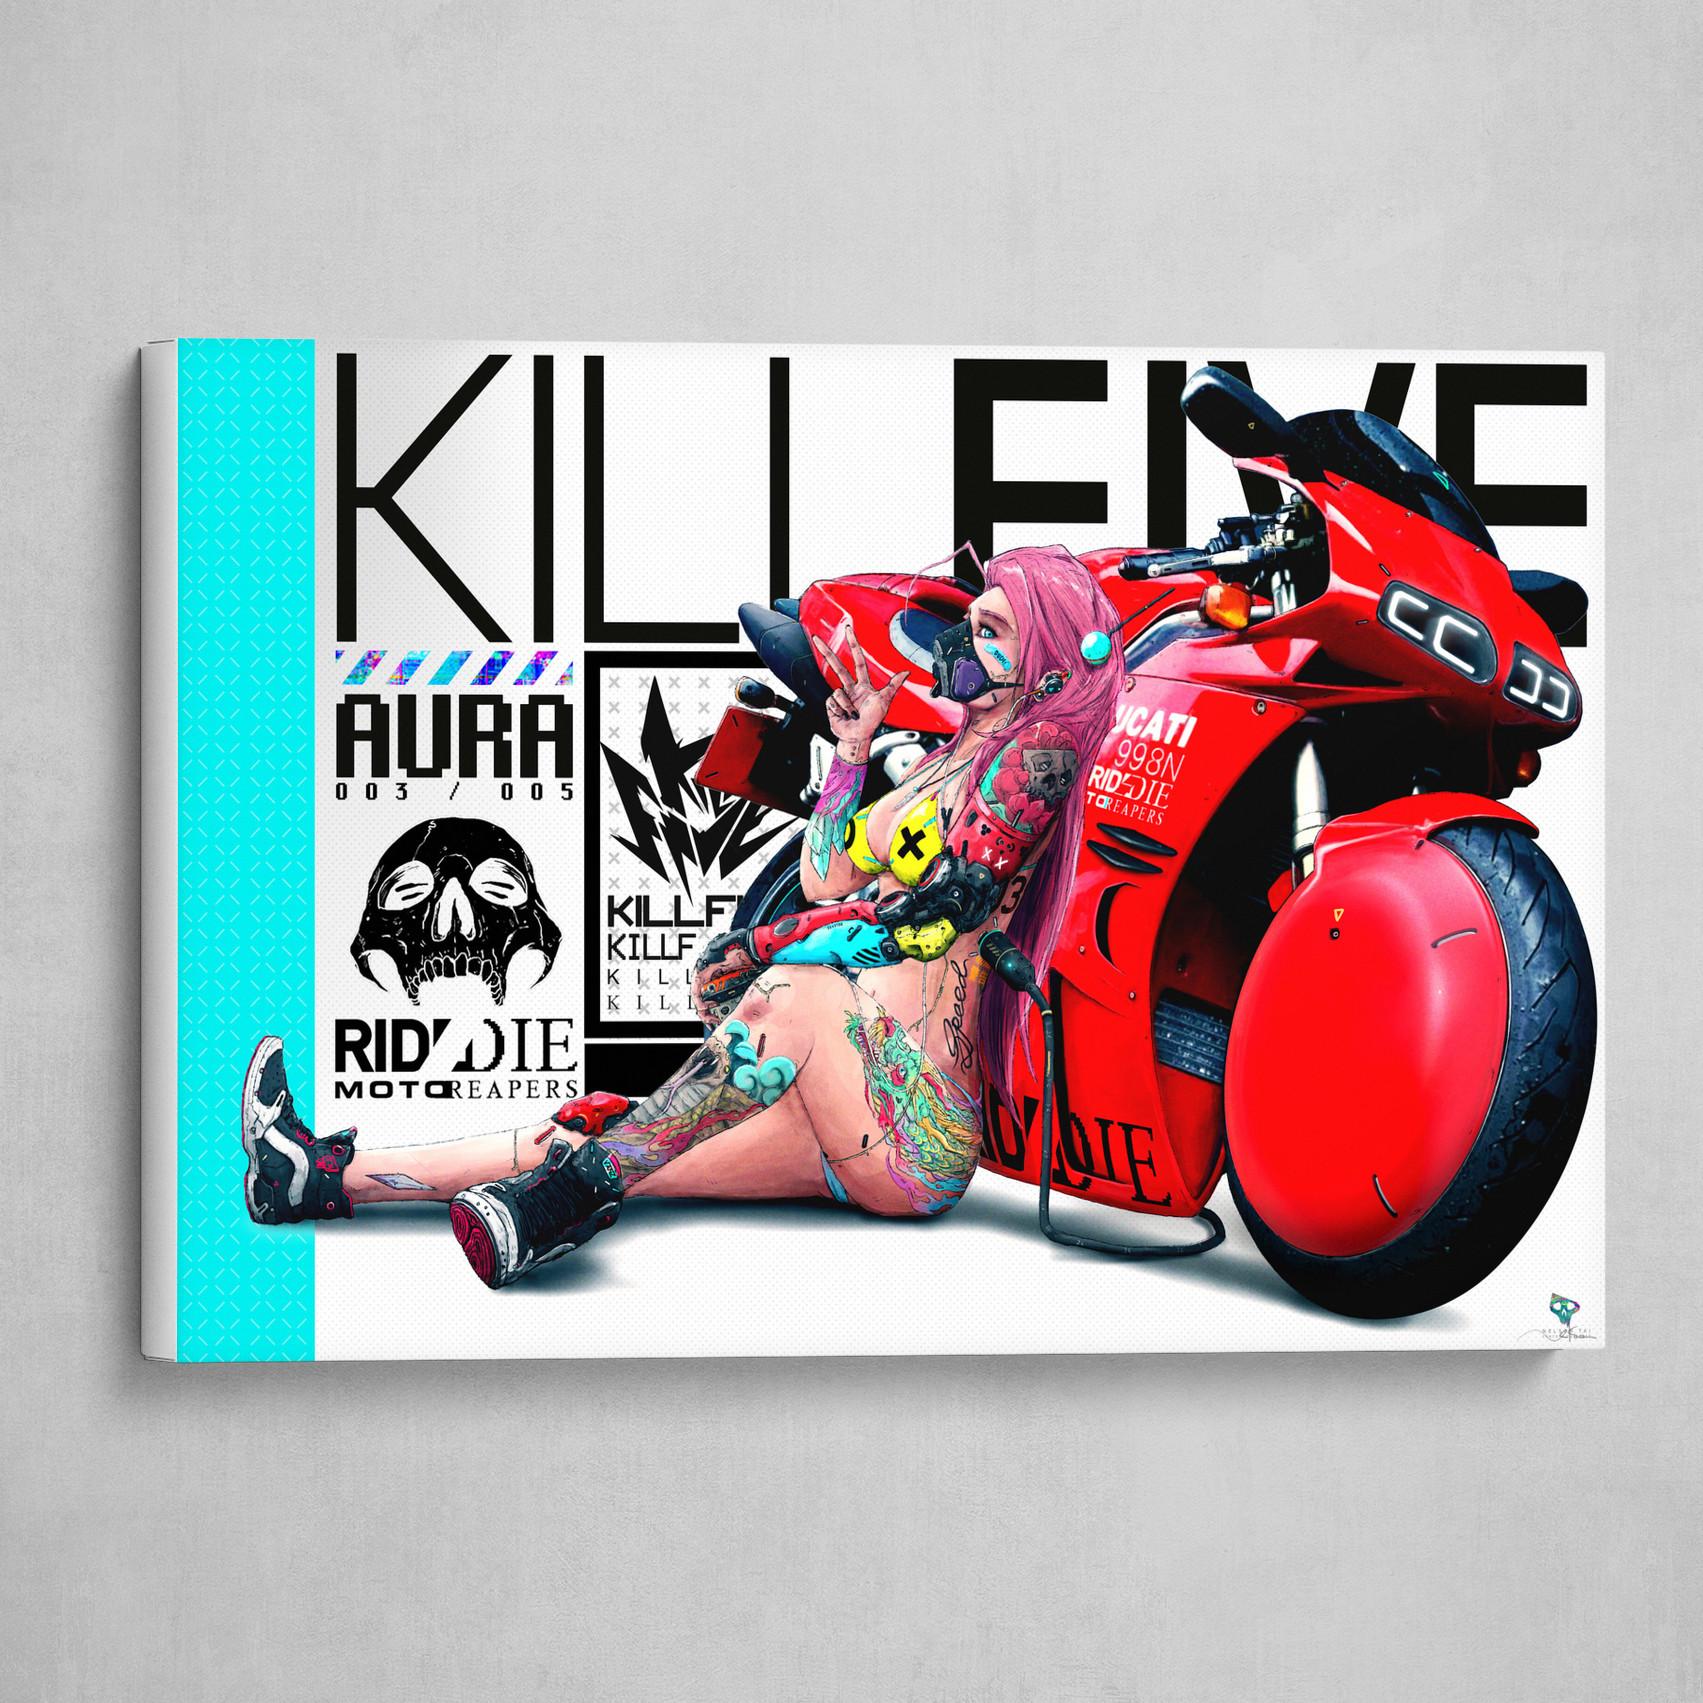 AURA | KILLFIVE